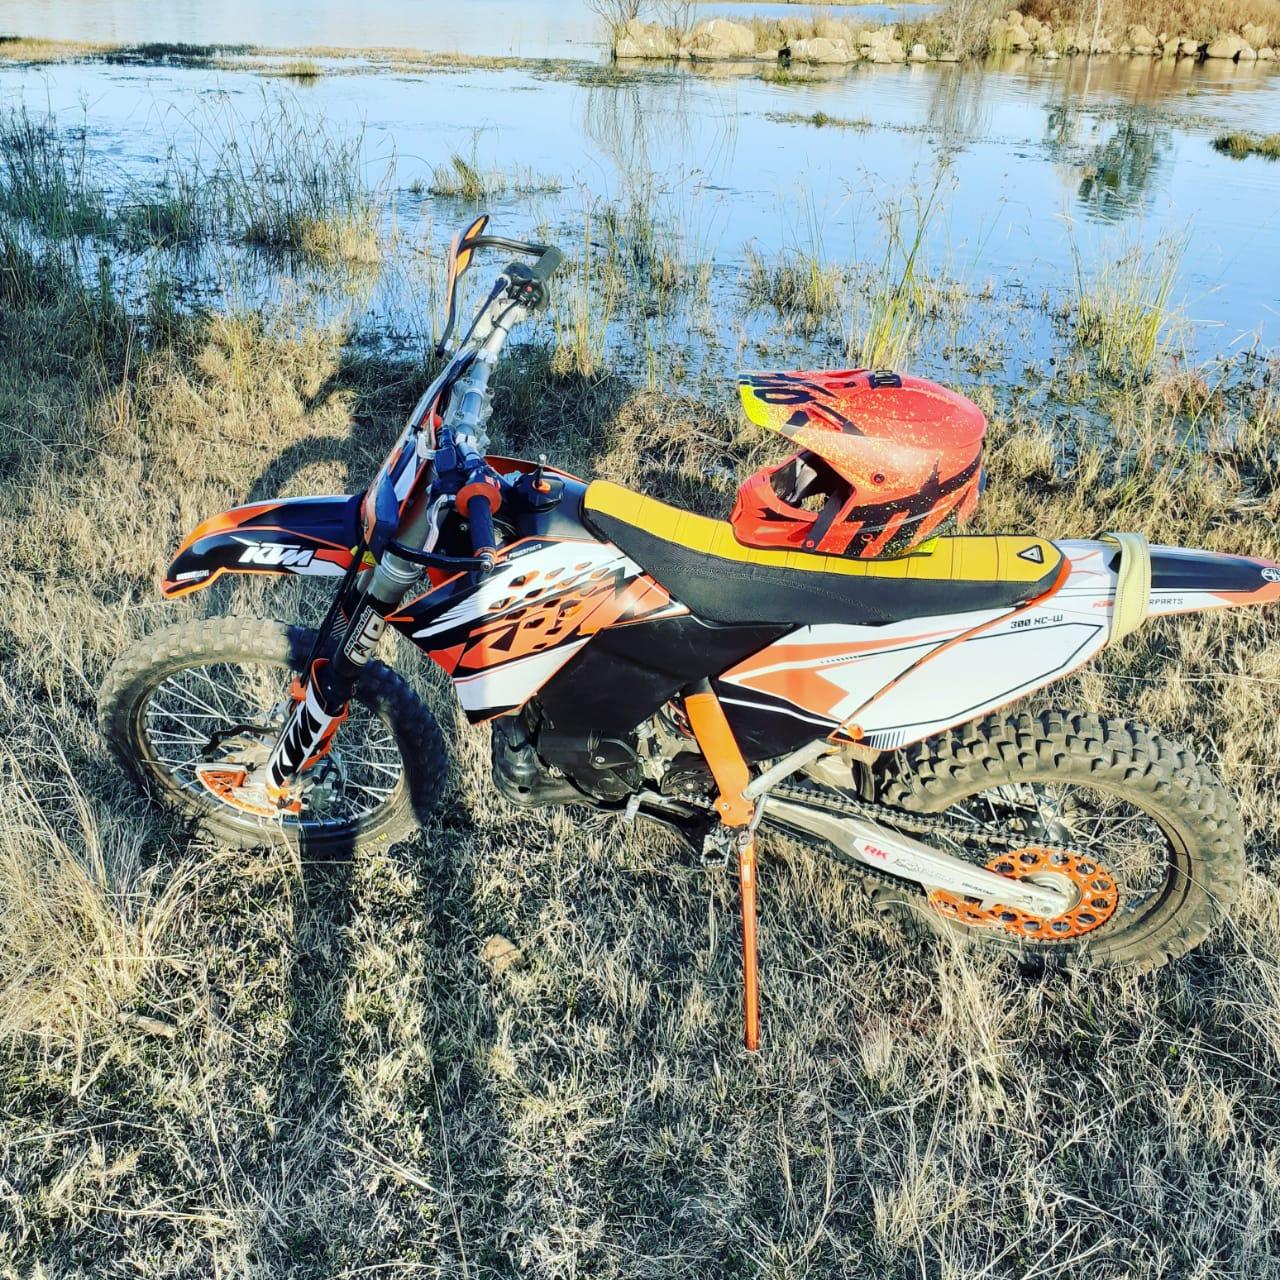 2009 KTM 350 EXC-F